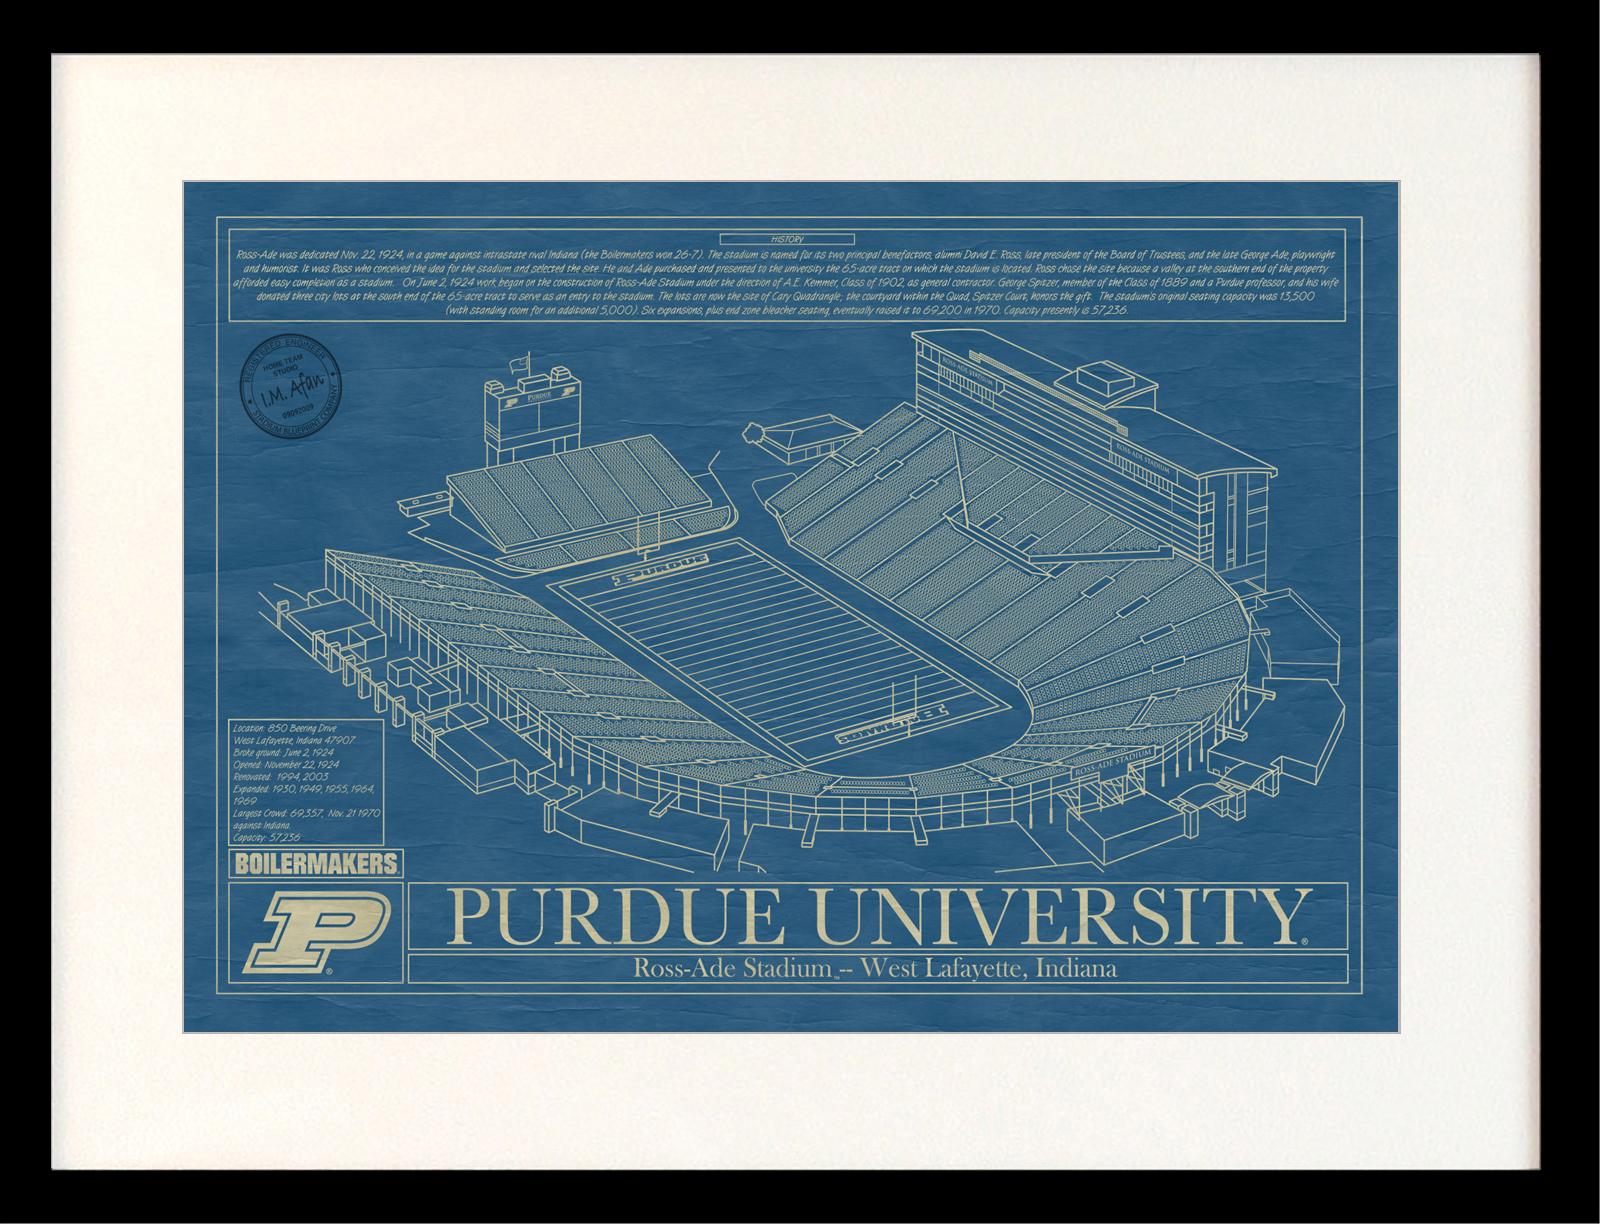 Purdue university ross ade stadium blueprint art stadium purdue university ross ade stadium blueprint art malvernweather Gallery